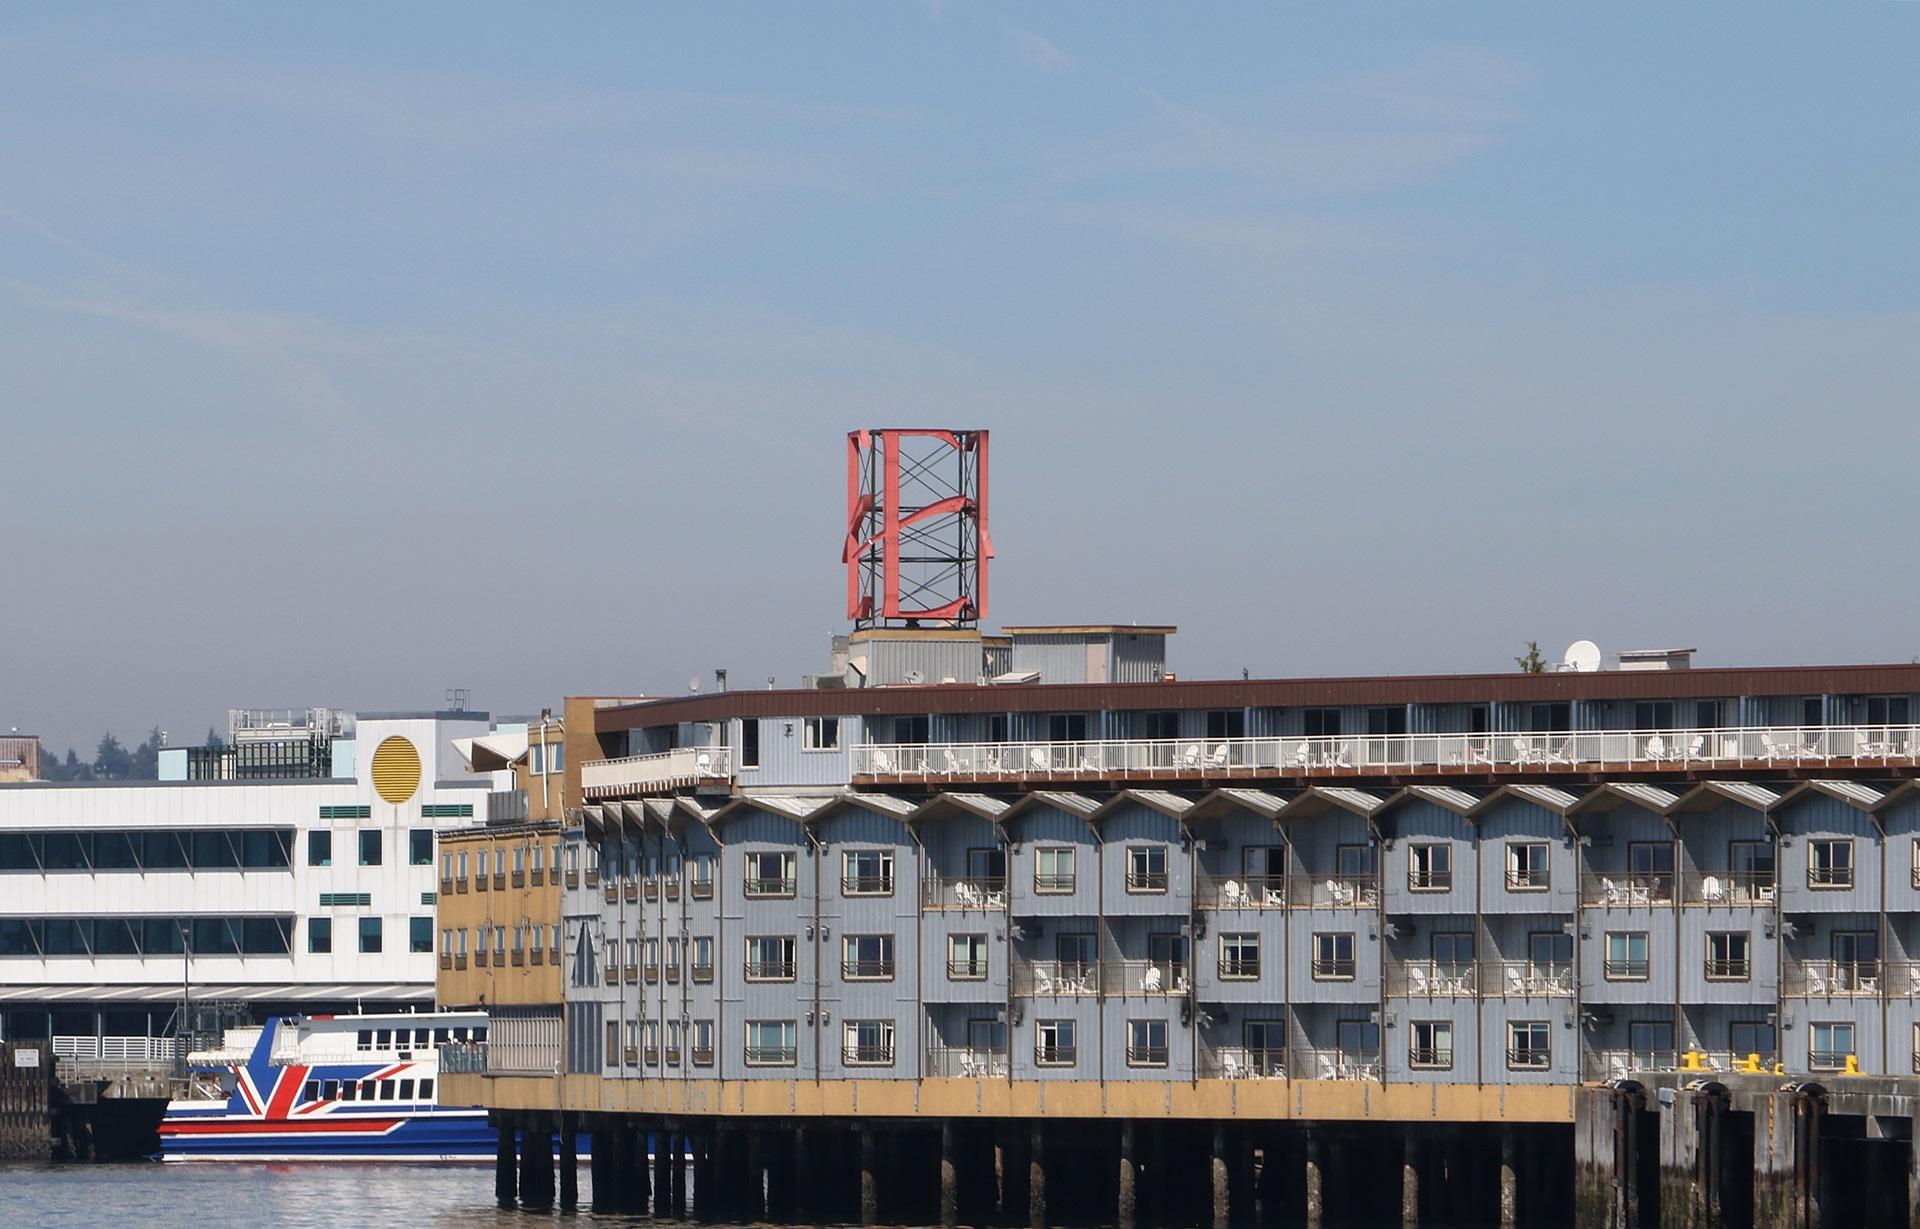 The edgewater hotel argosy cruises for The edge water